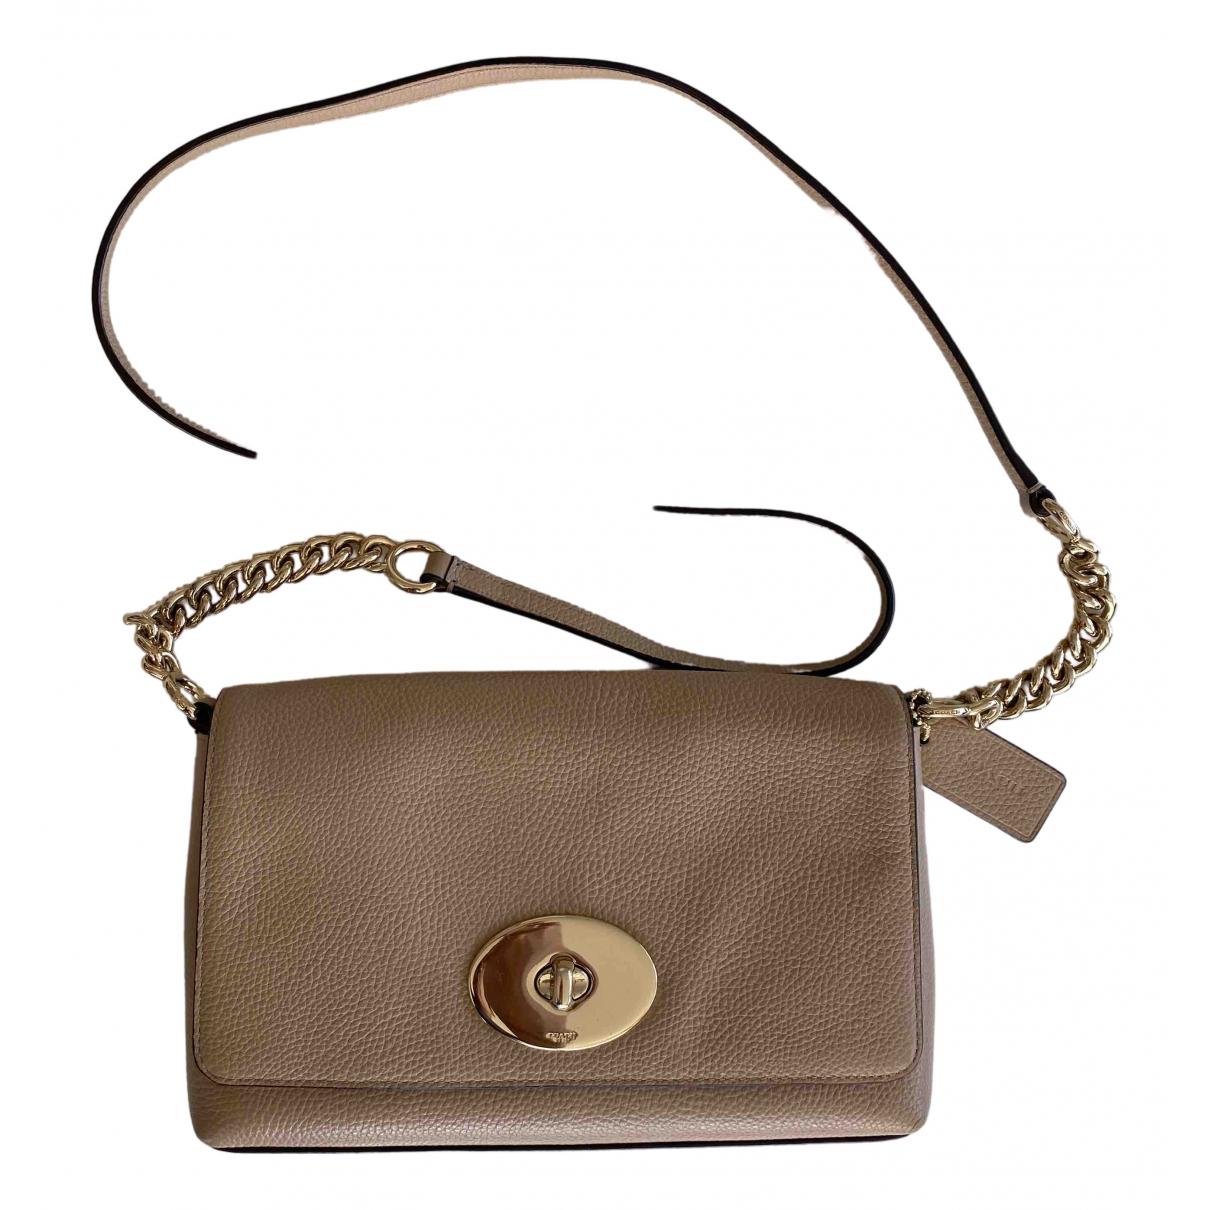 Coach Glovetan Dinky Crossbody Beige Leather handbag for Women \N